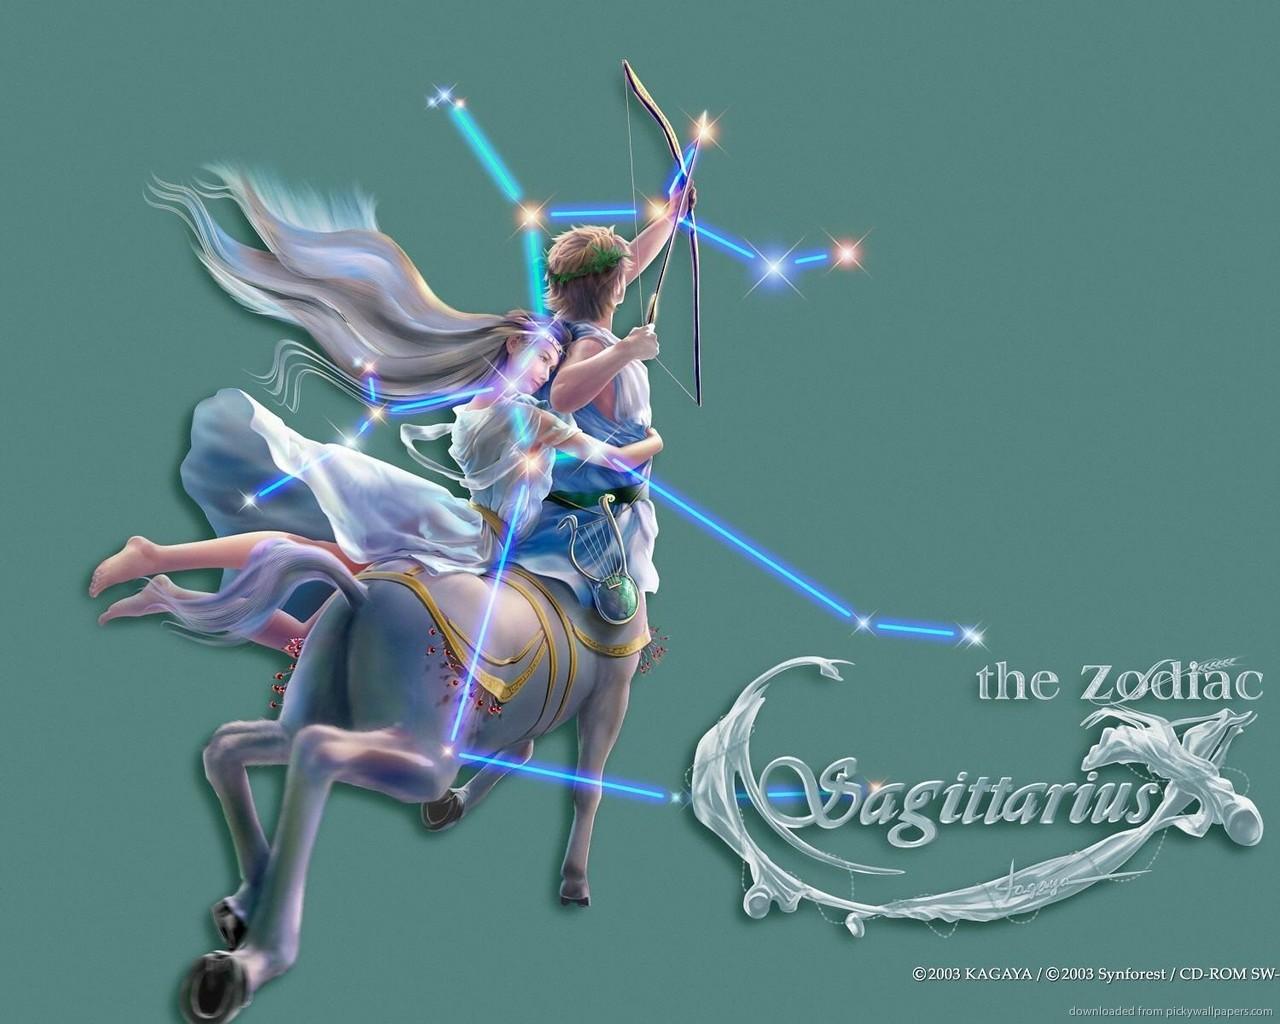 Sagittarius Wallpaper 11861 Hd Wallpapers in Zodiac   Imagescicom 1280x1024